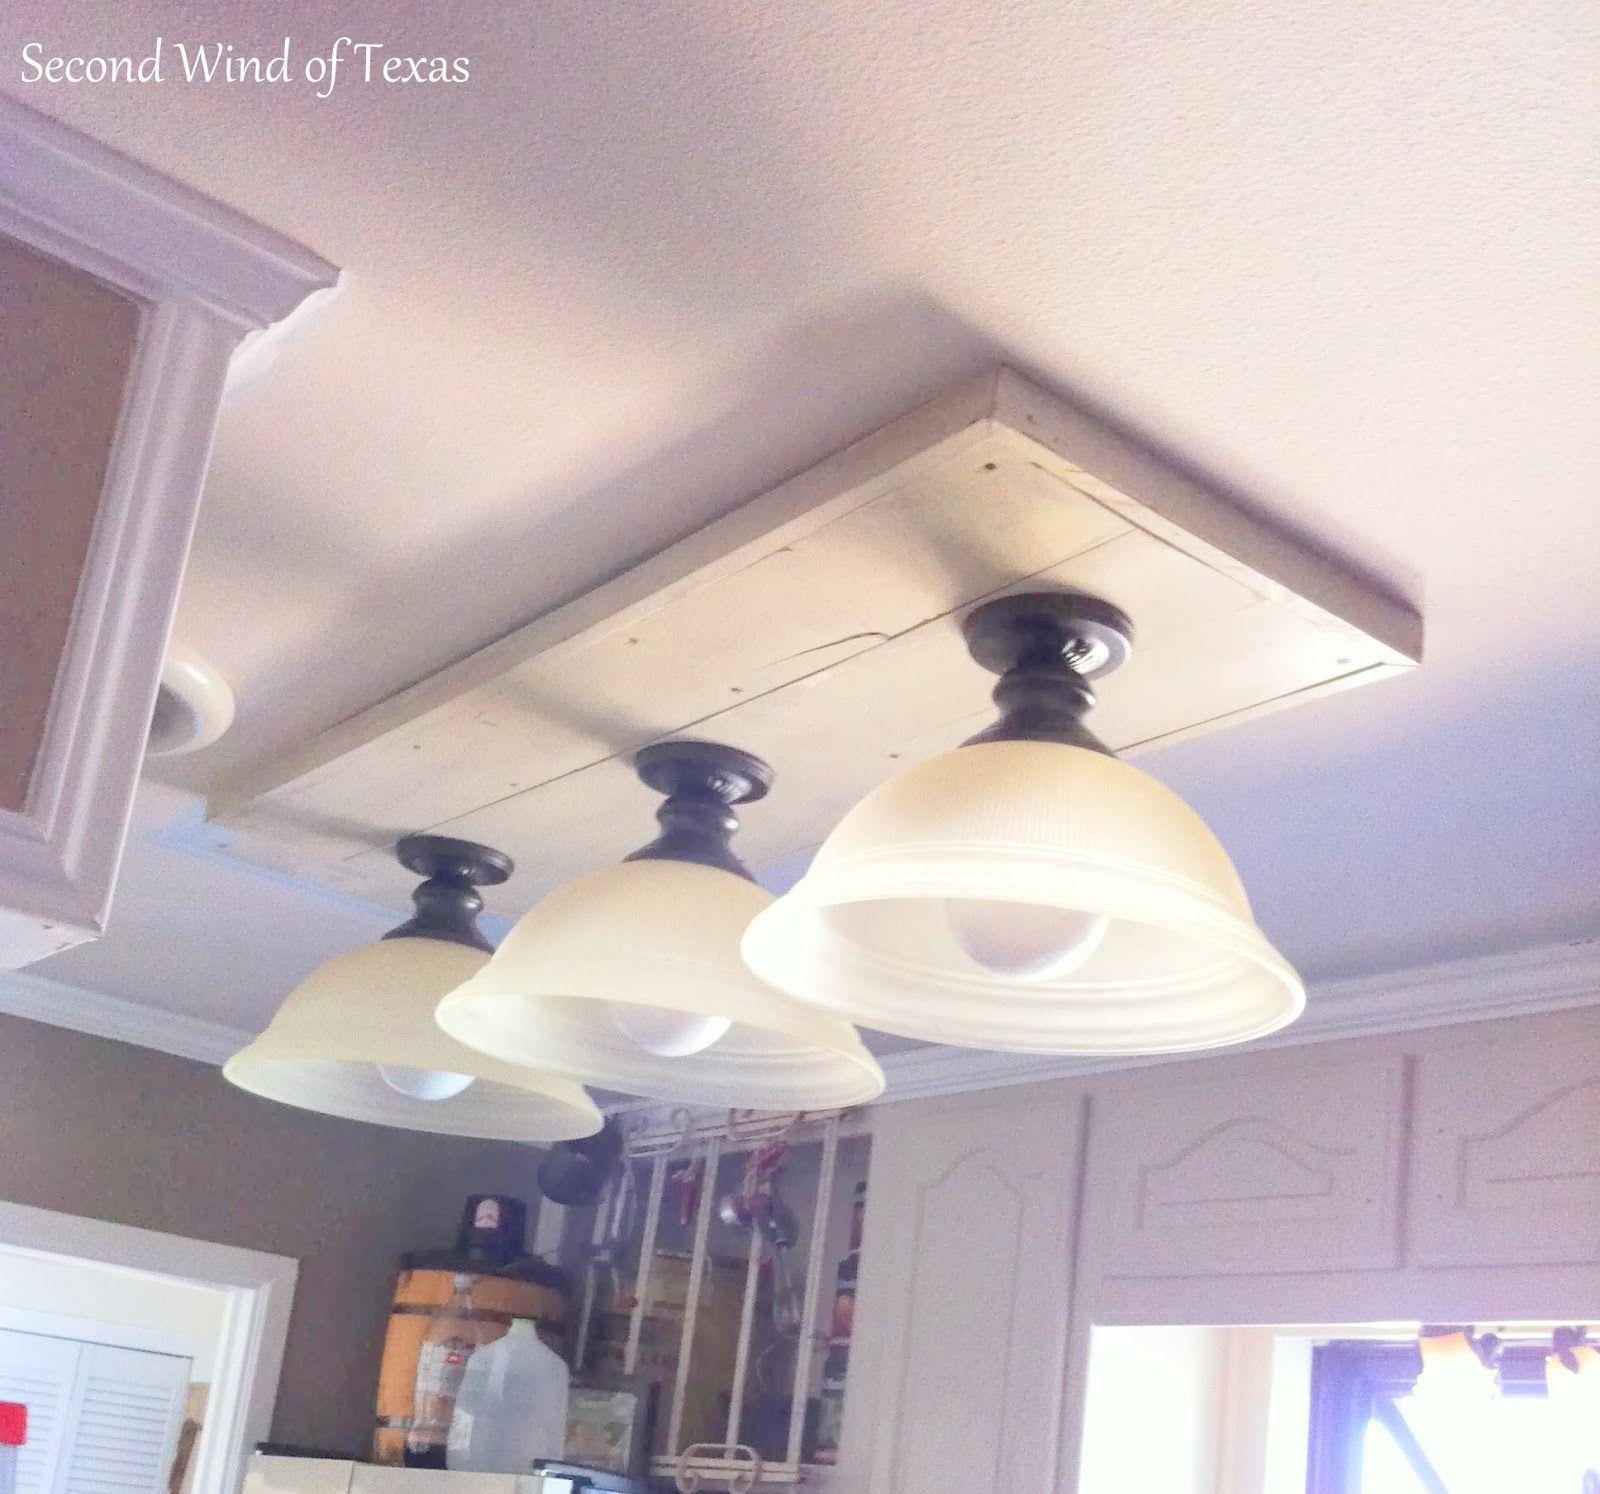 Replacing installing fluorescent light fixture ideas kitchen redo replacing installing fluorescent light fixture ideas arubaitofo Image collections